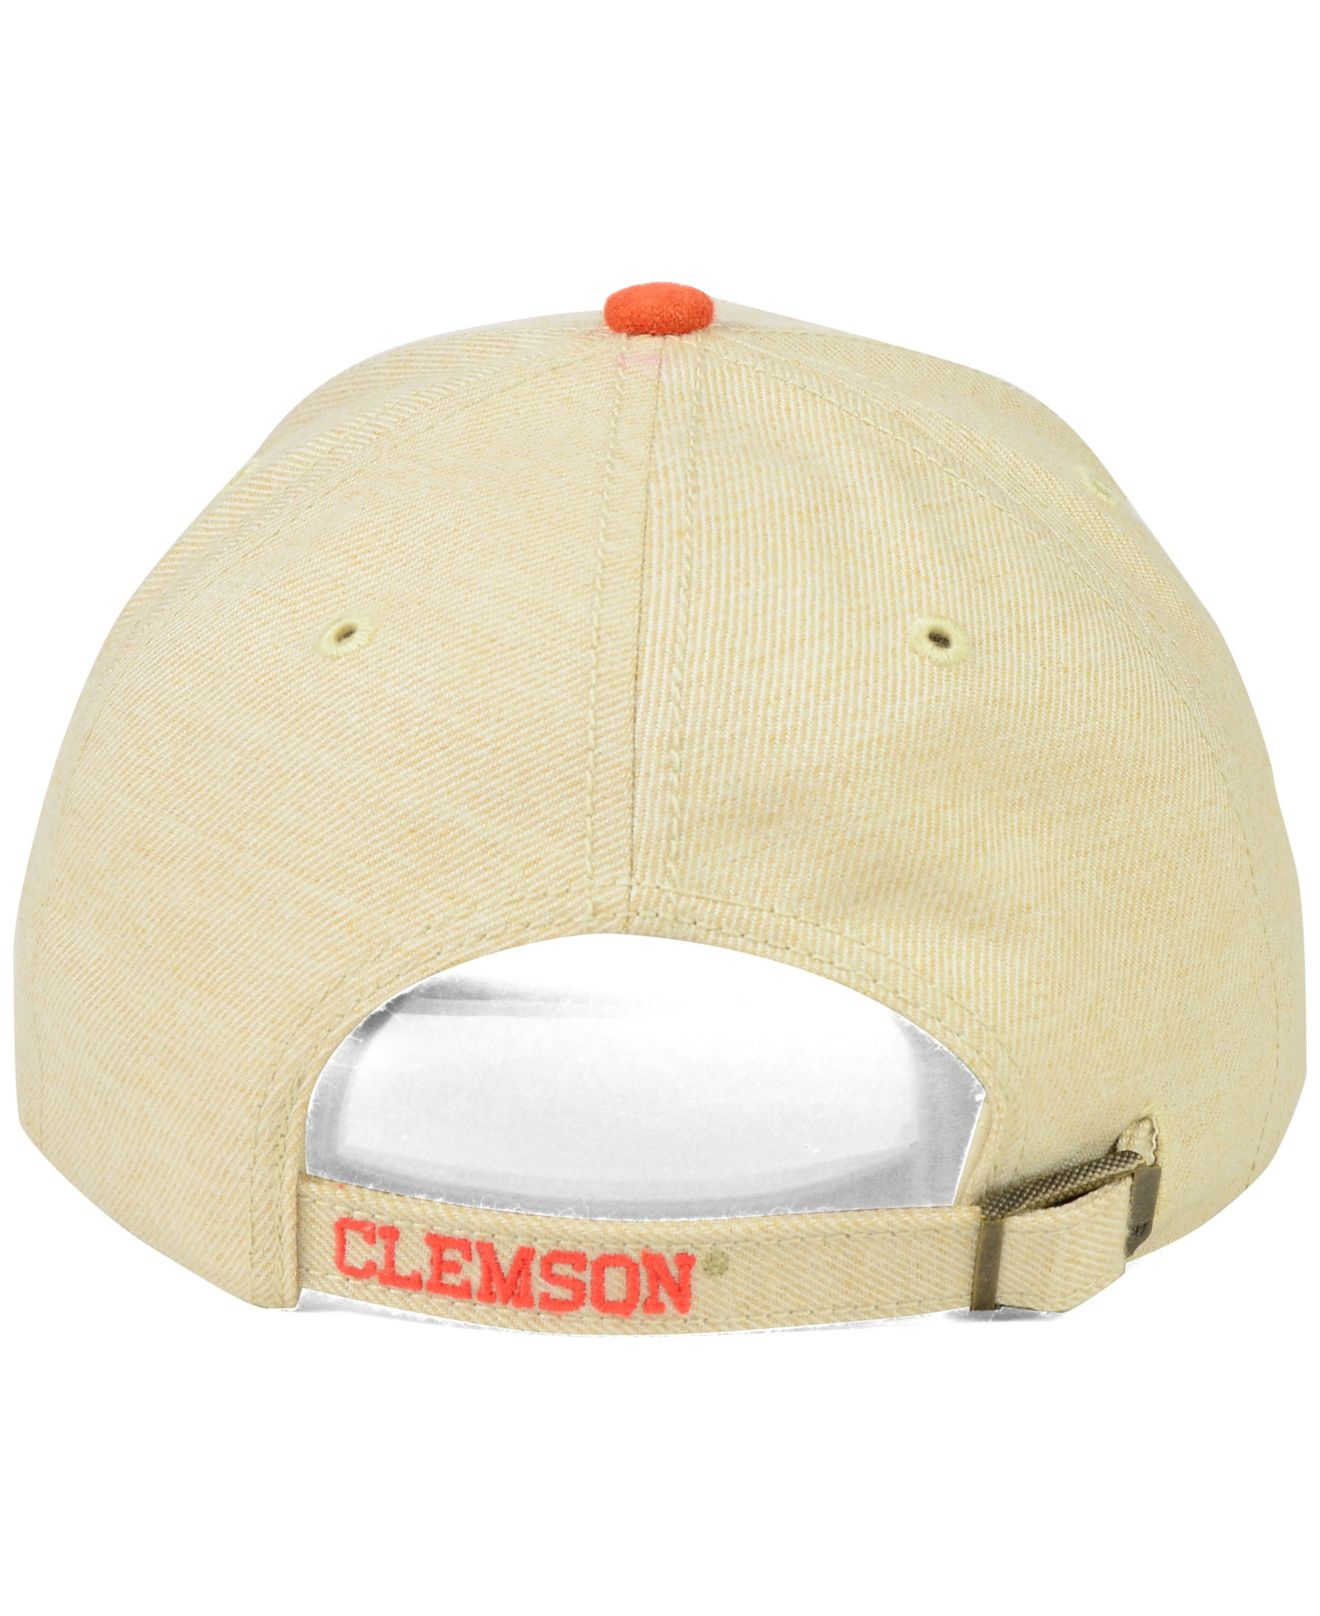 new product 22f19 71e7d ... denmark denmark lyst 47 brand clemson tigers munson mvp cap in orange  for men add8a 2ad40